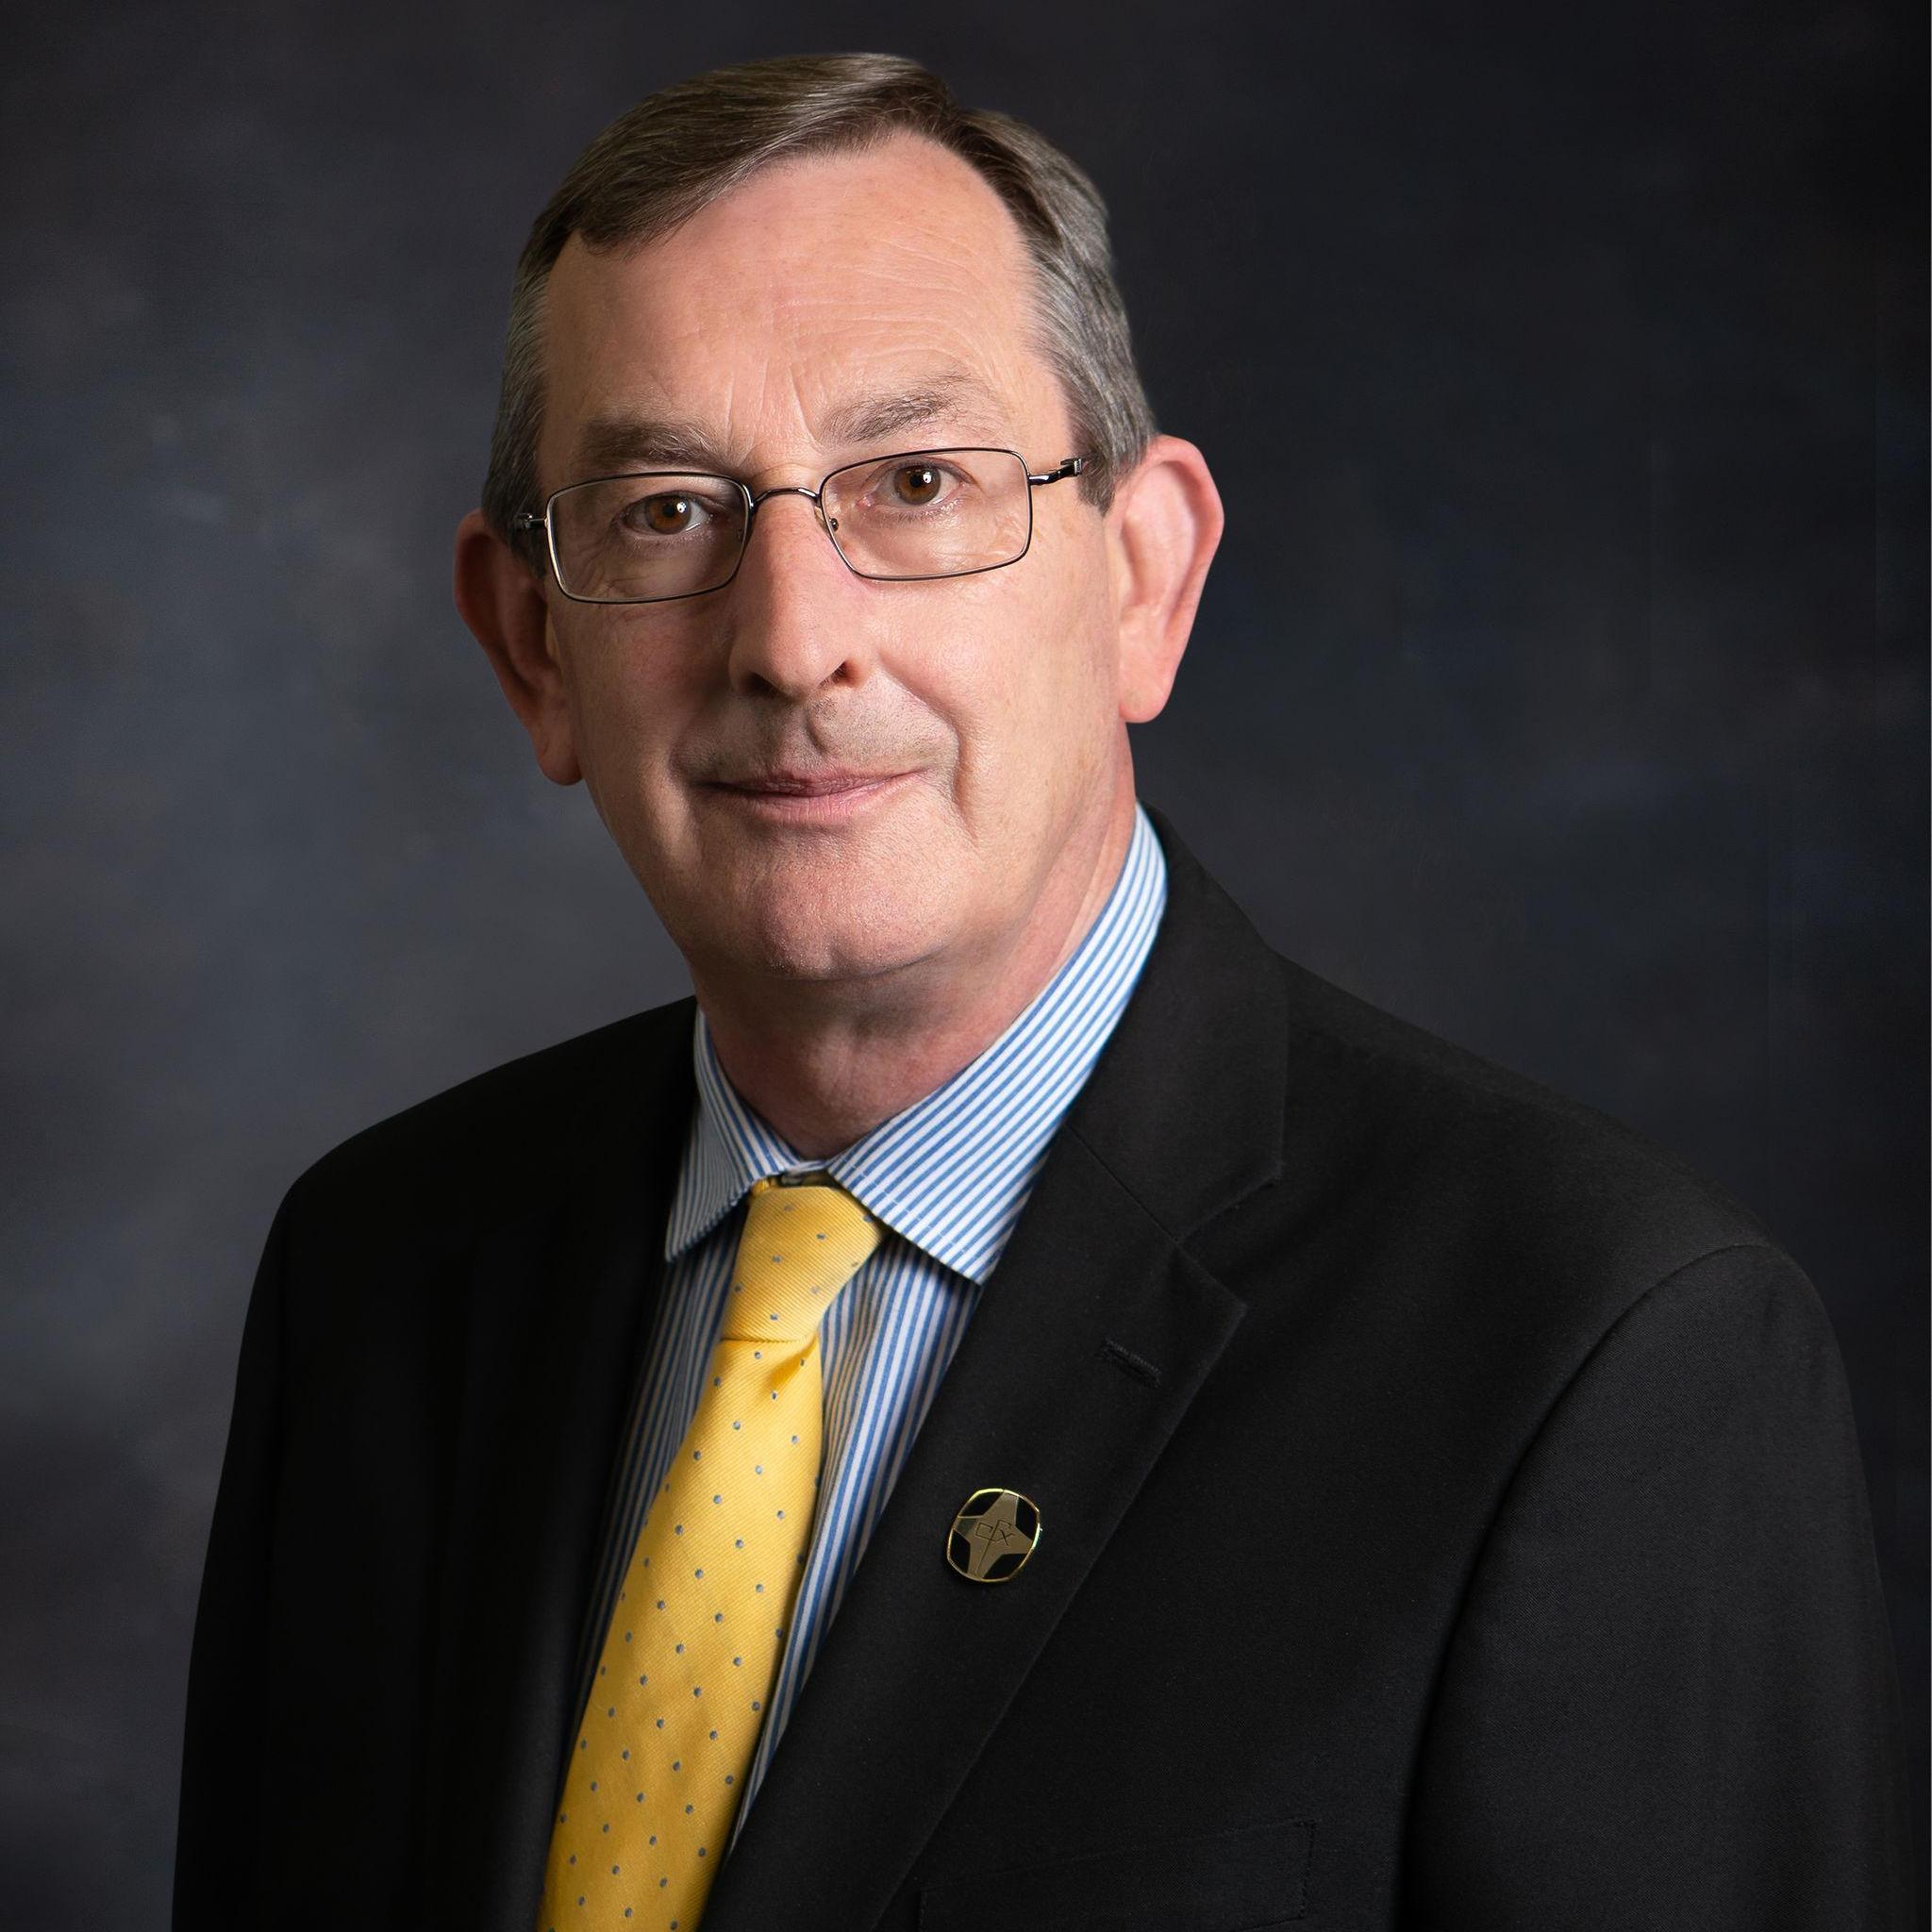 Brother Philip Revell, C.F.X.'s Profile Photo